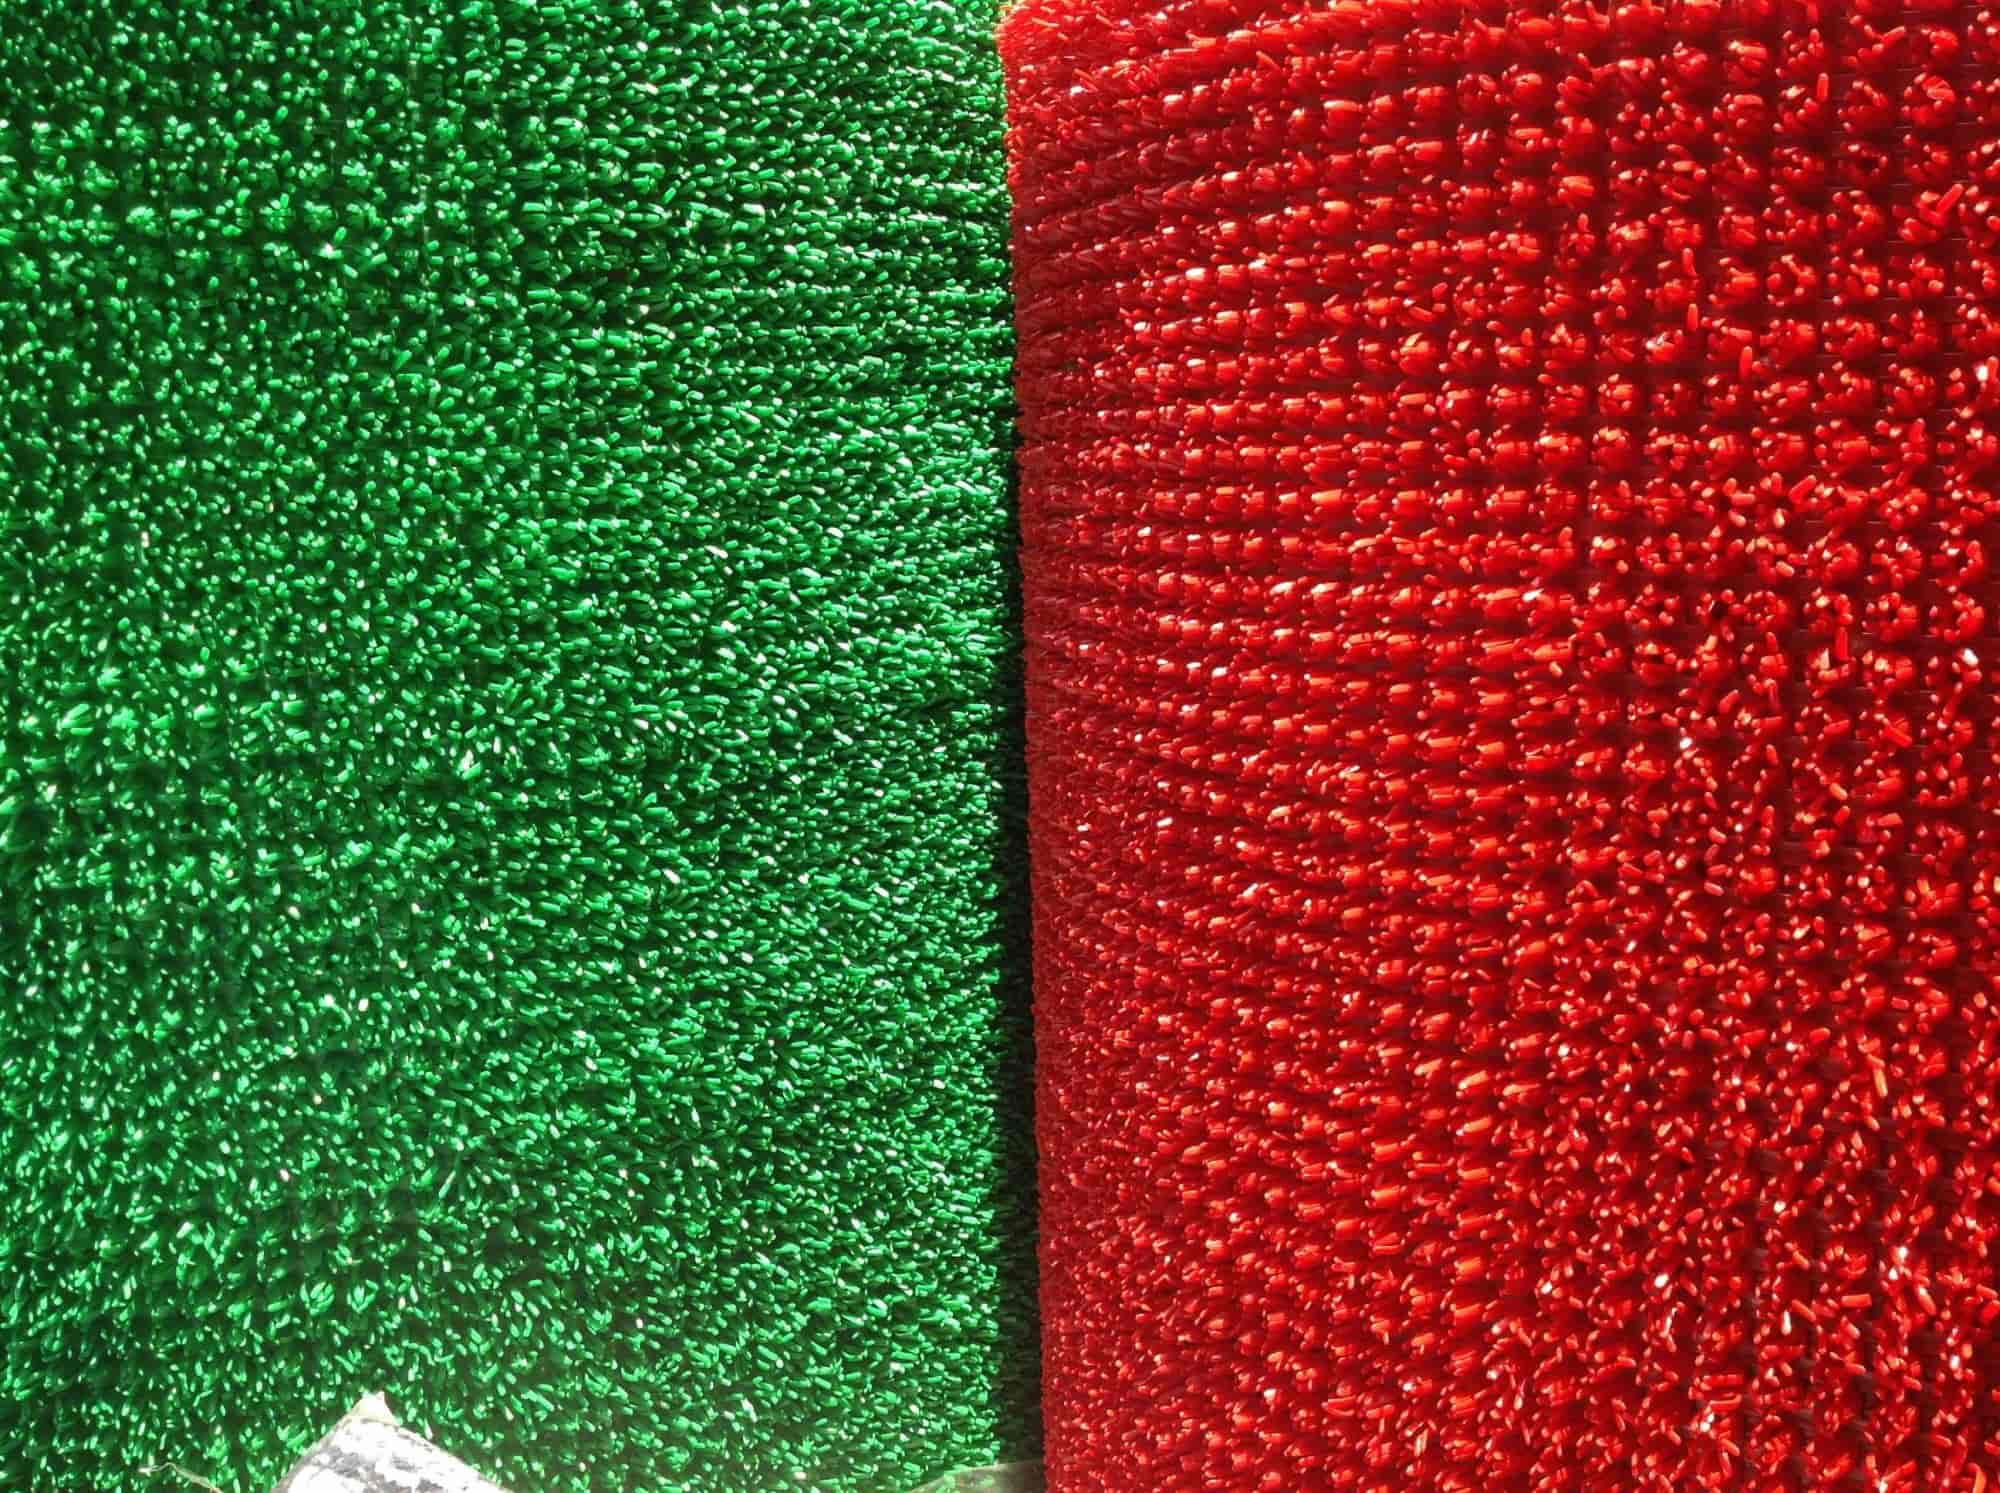 Great Wallpaper Name Sneha - sneha-carpets-and-wallpaper-katraj-pune-wall-paper-dealers-2eb27b0  Best Photo Reference_446960.jpg